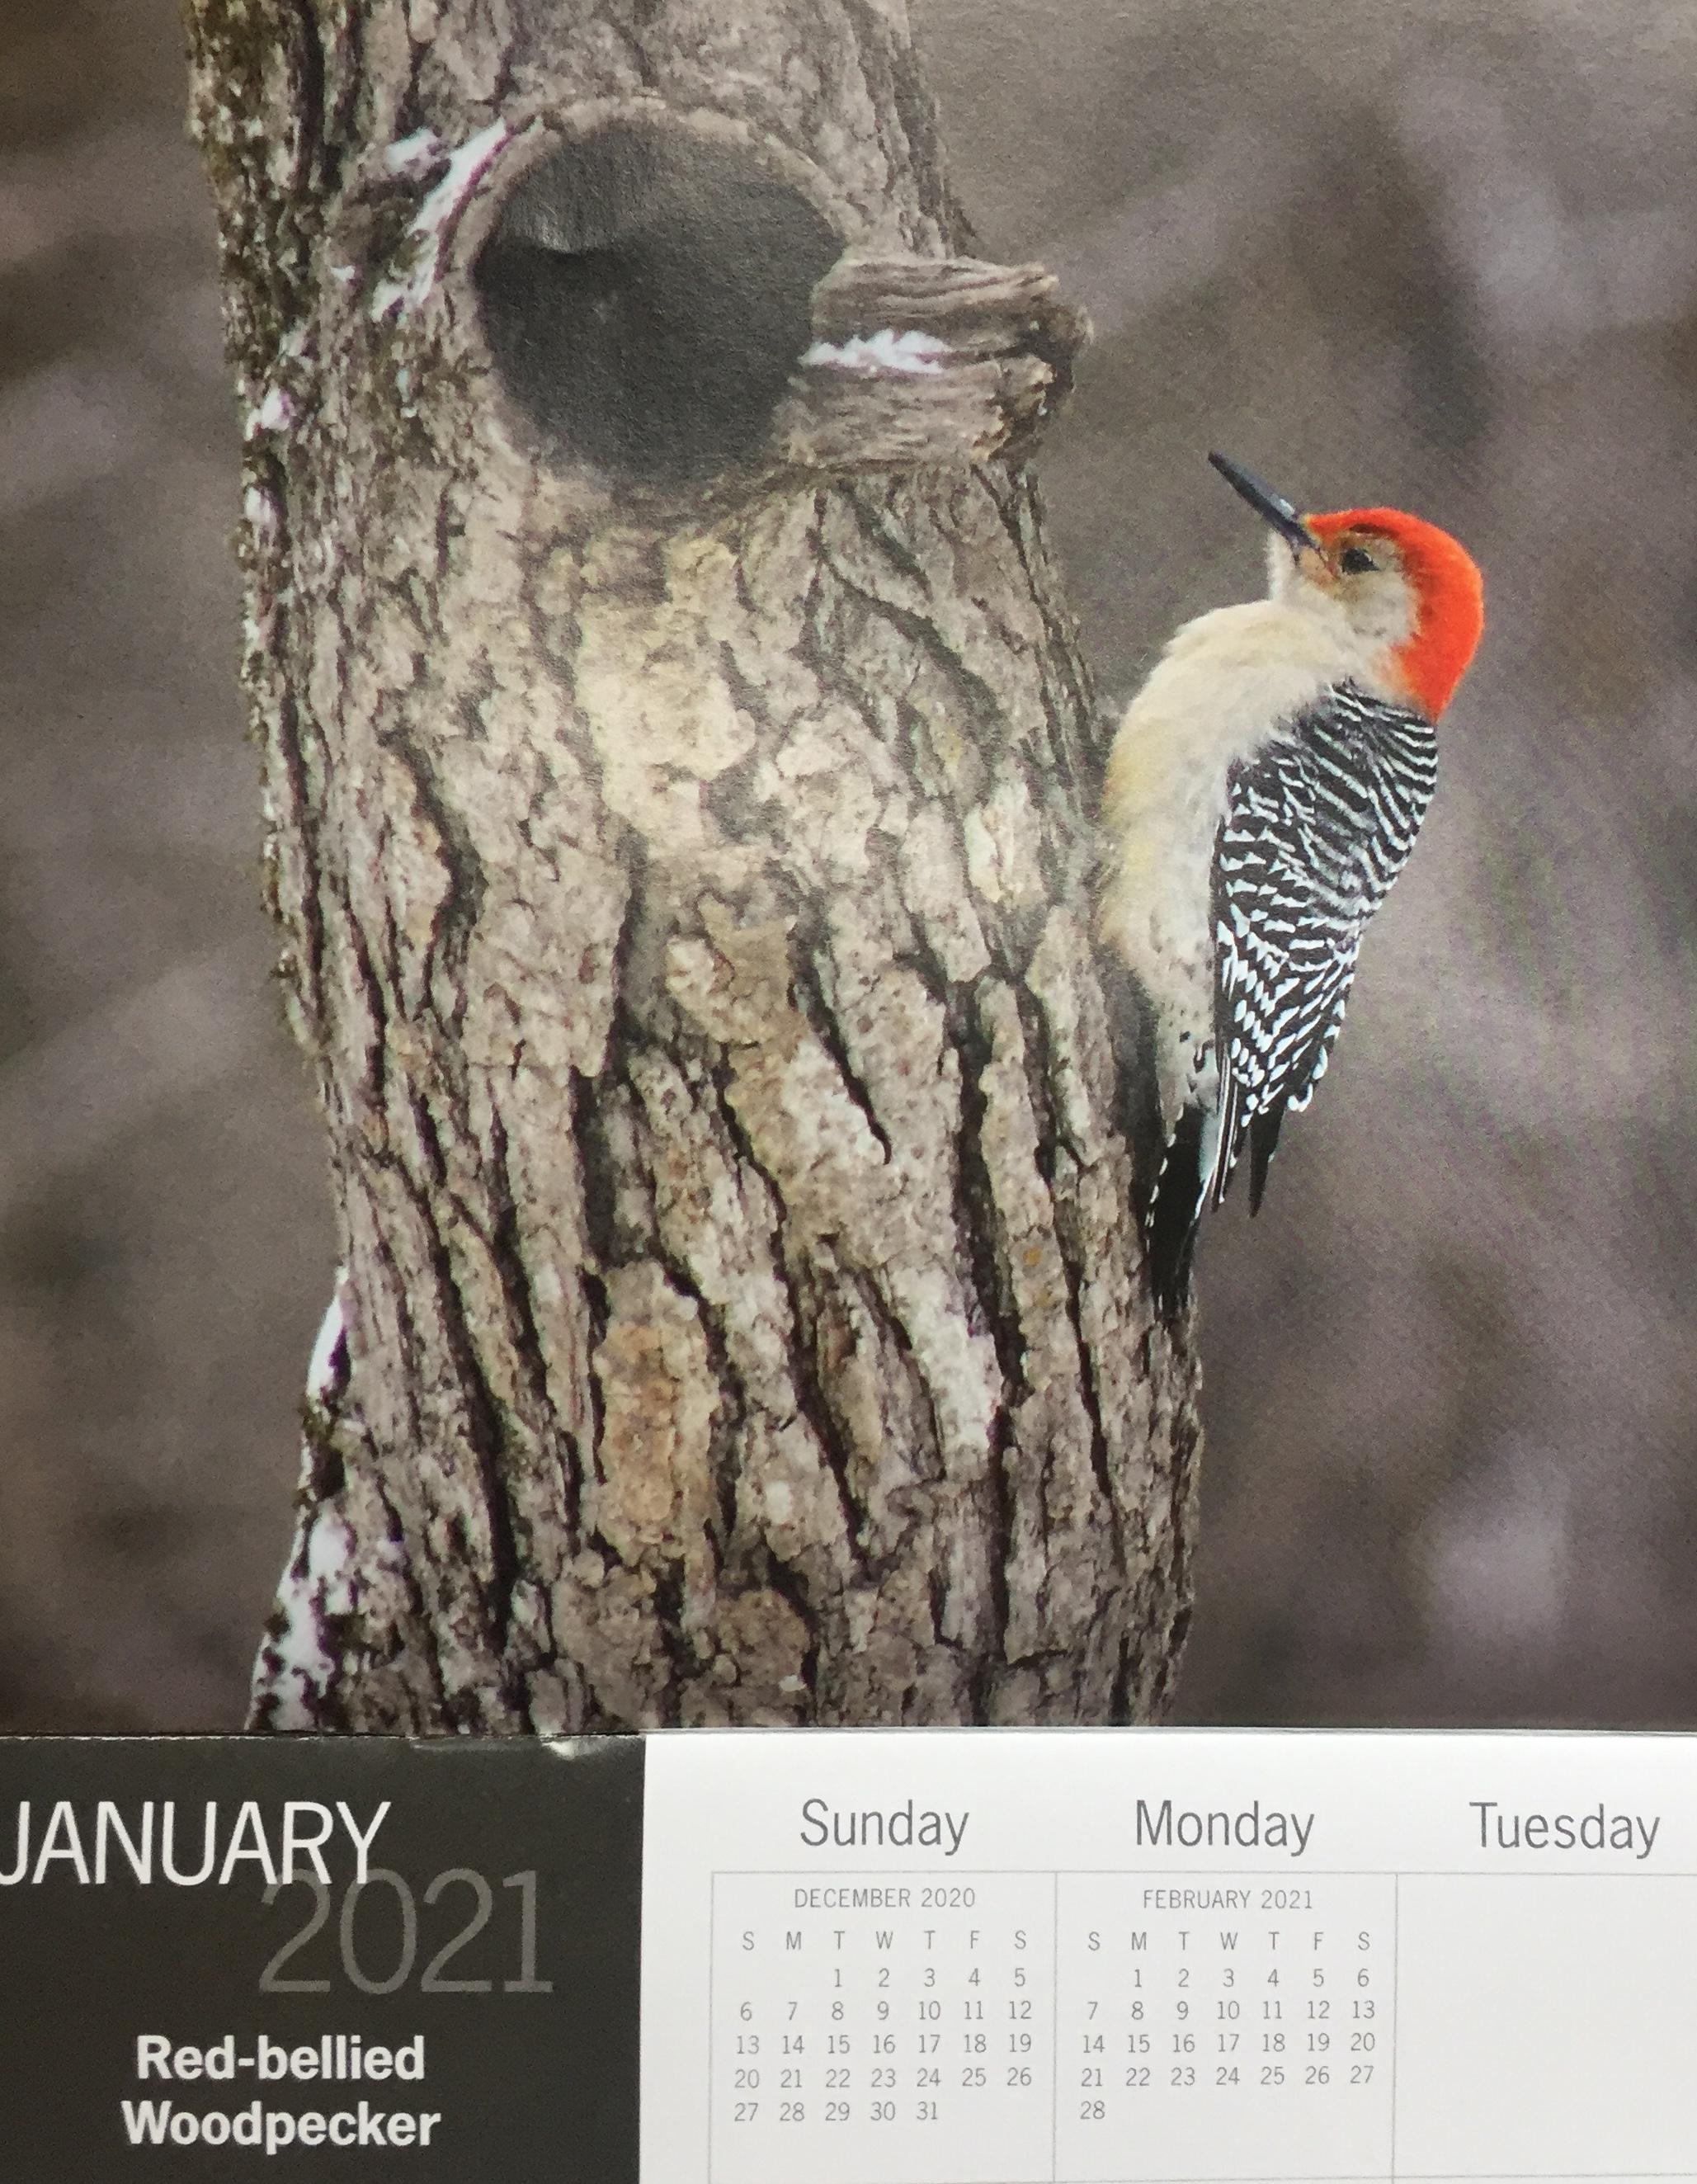 January 2021 calendar featuring red-bellied woodpecker